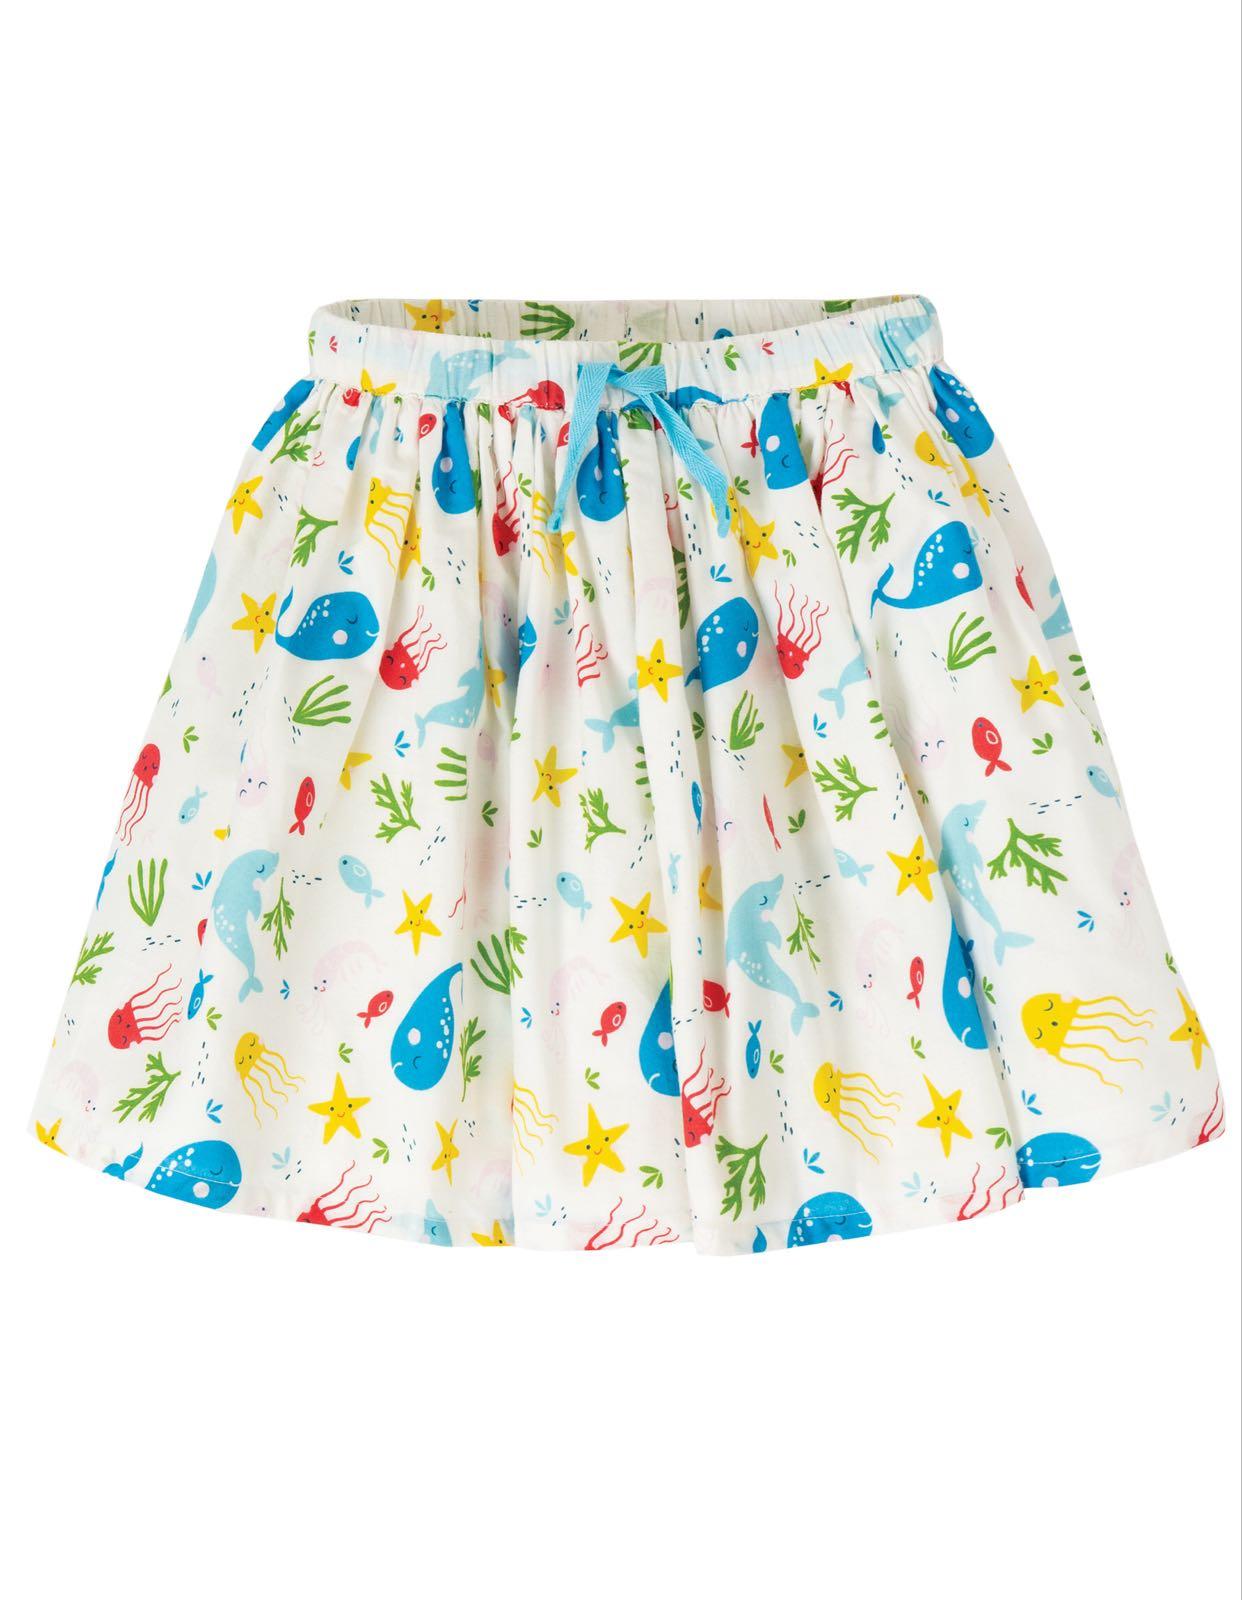 Frugi Fiona Full Skirt Splashing About